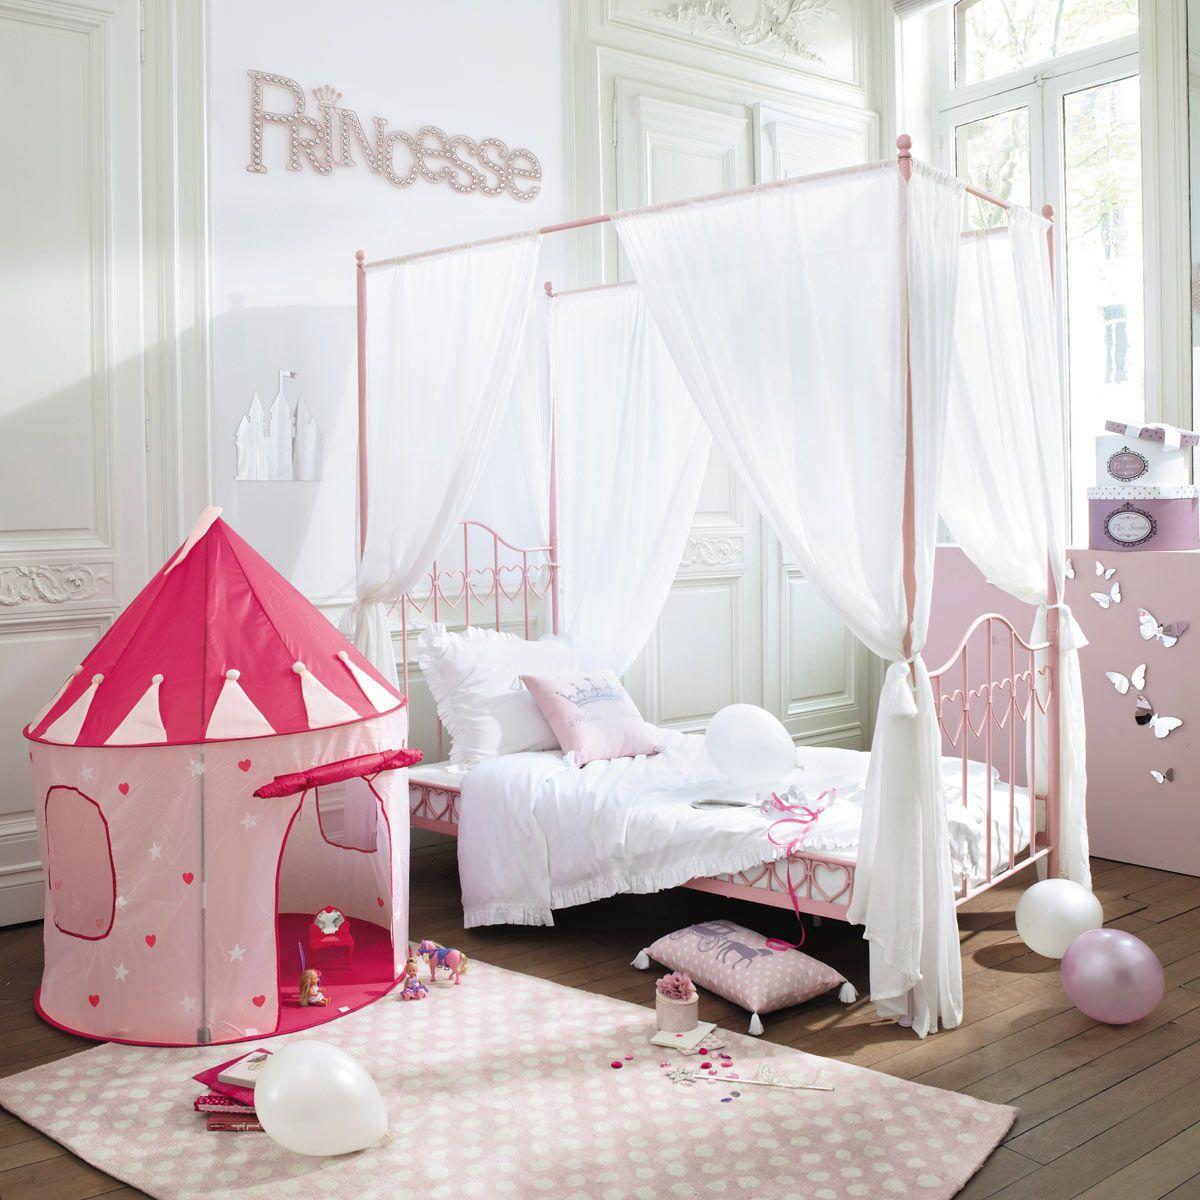 lit à baldaquin enfant 90x190 en métal rose | baldaquin, lits et roses